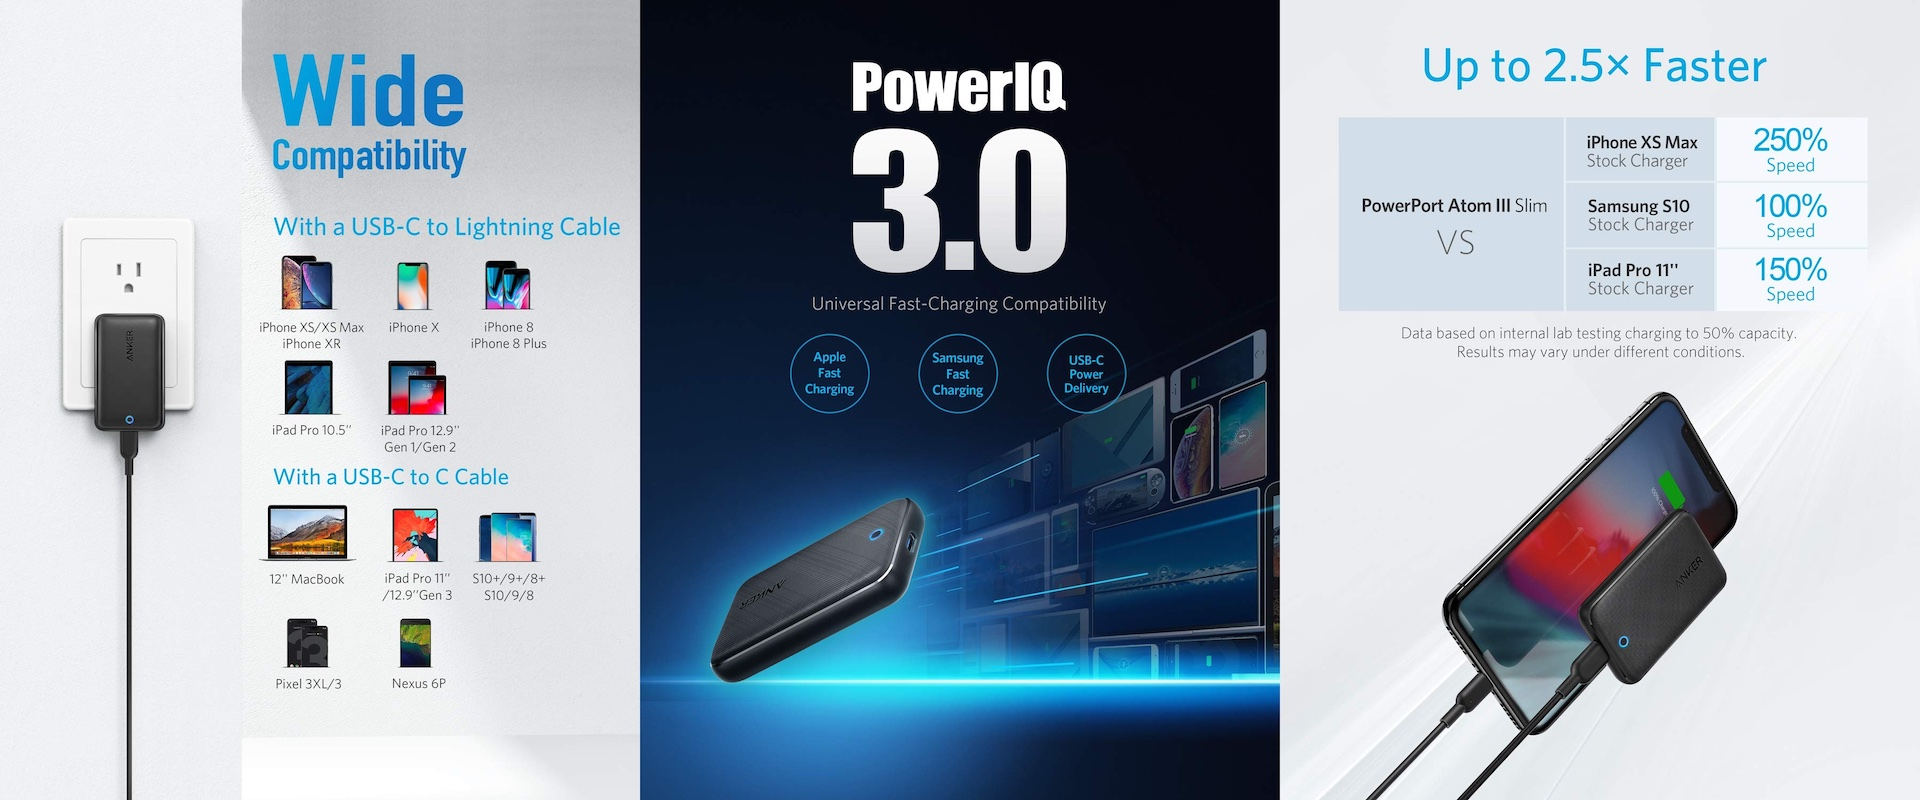 Anker PowerPort Atom III SlimのPIQ3